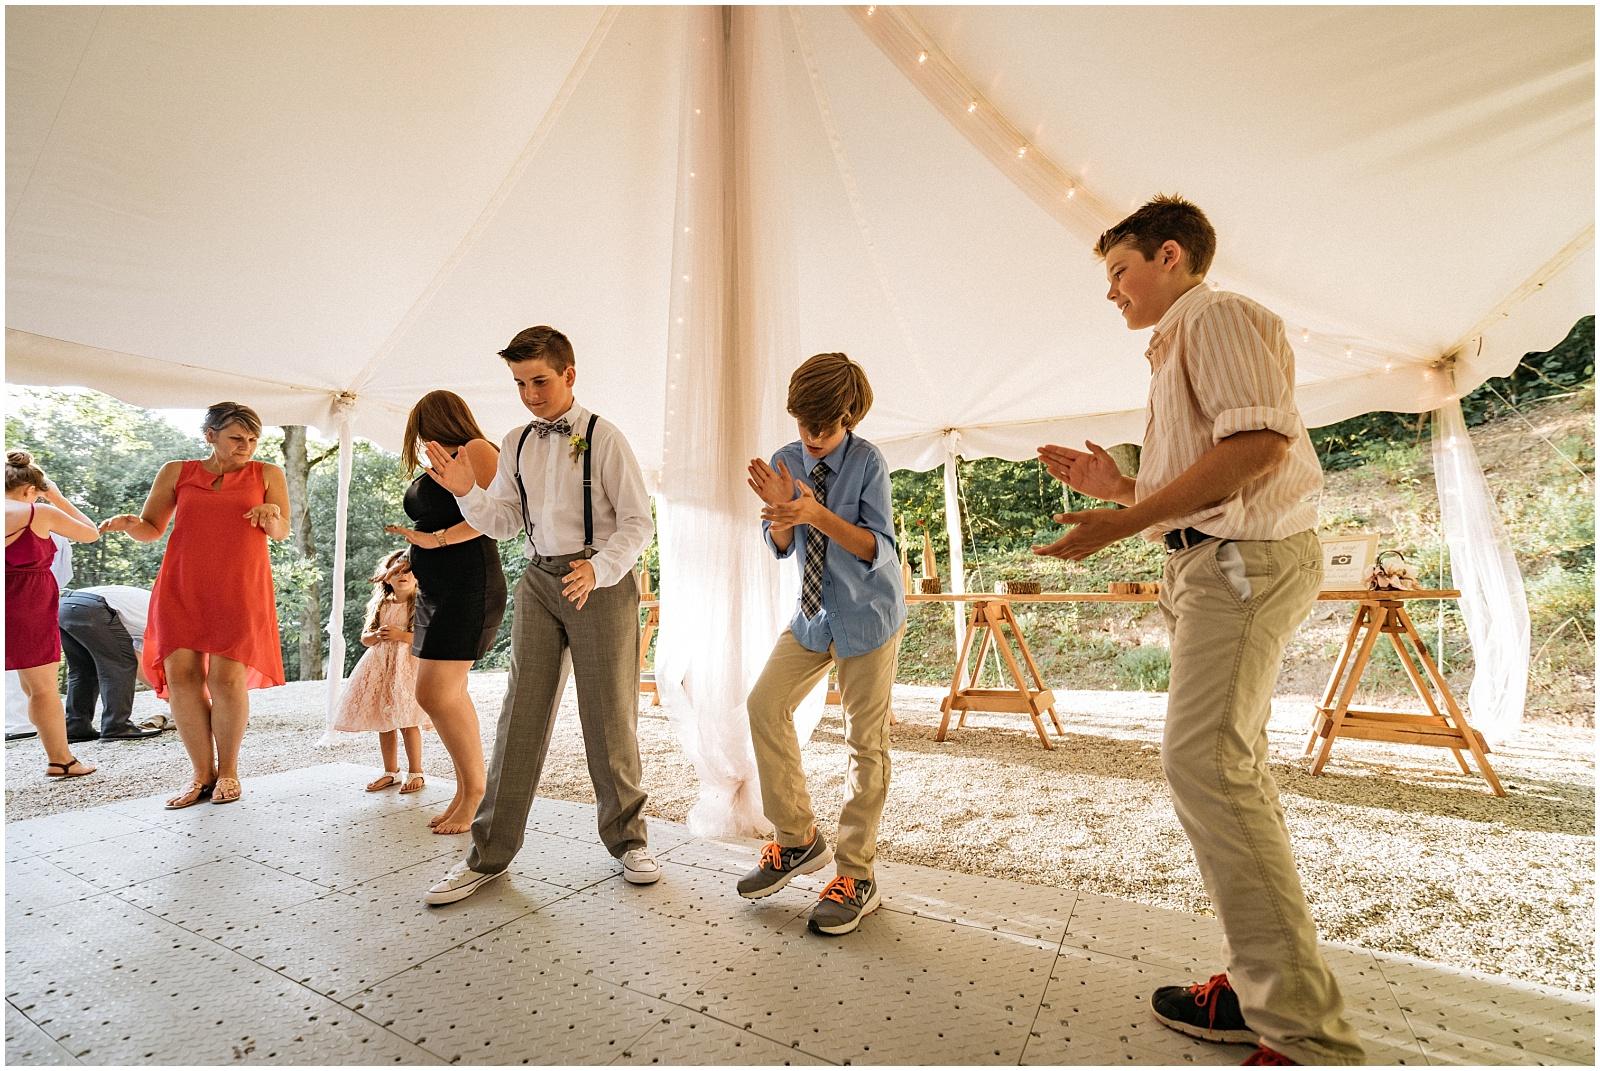 Ryan_Rechelle_Nantahalla_Weddings_Andrews_NC-142_Ryan_Rechelle_McGuire's_Millrace_Andrews_NC.jpg